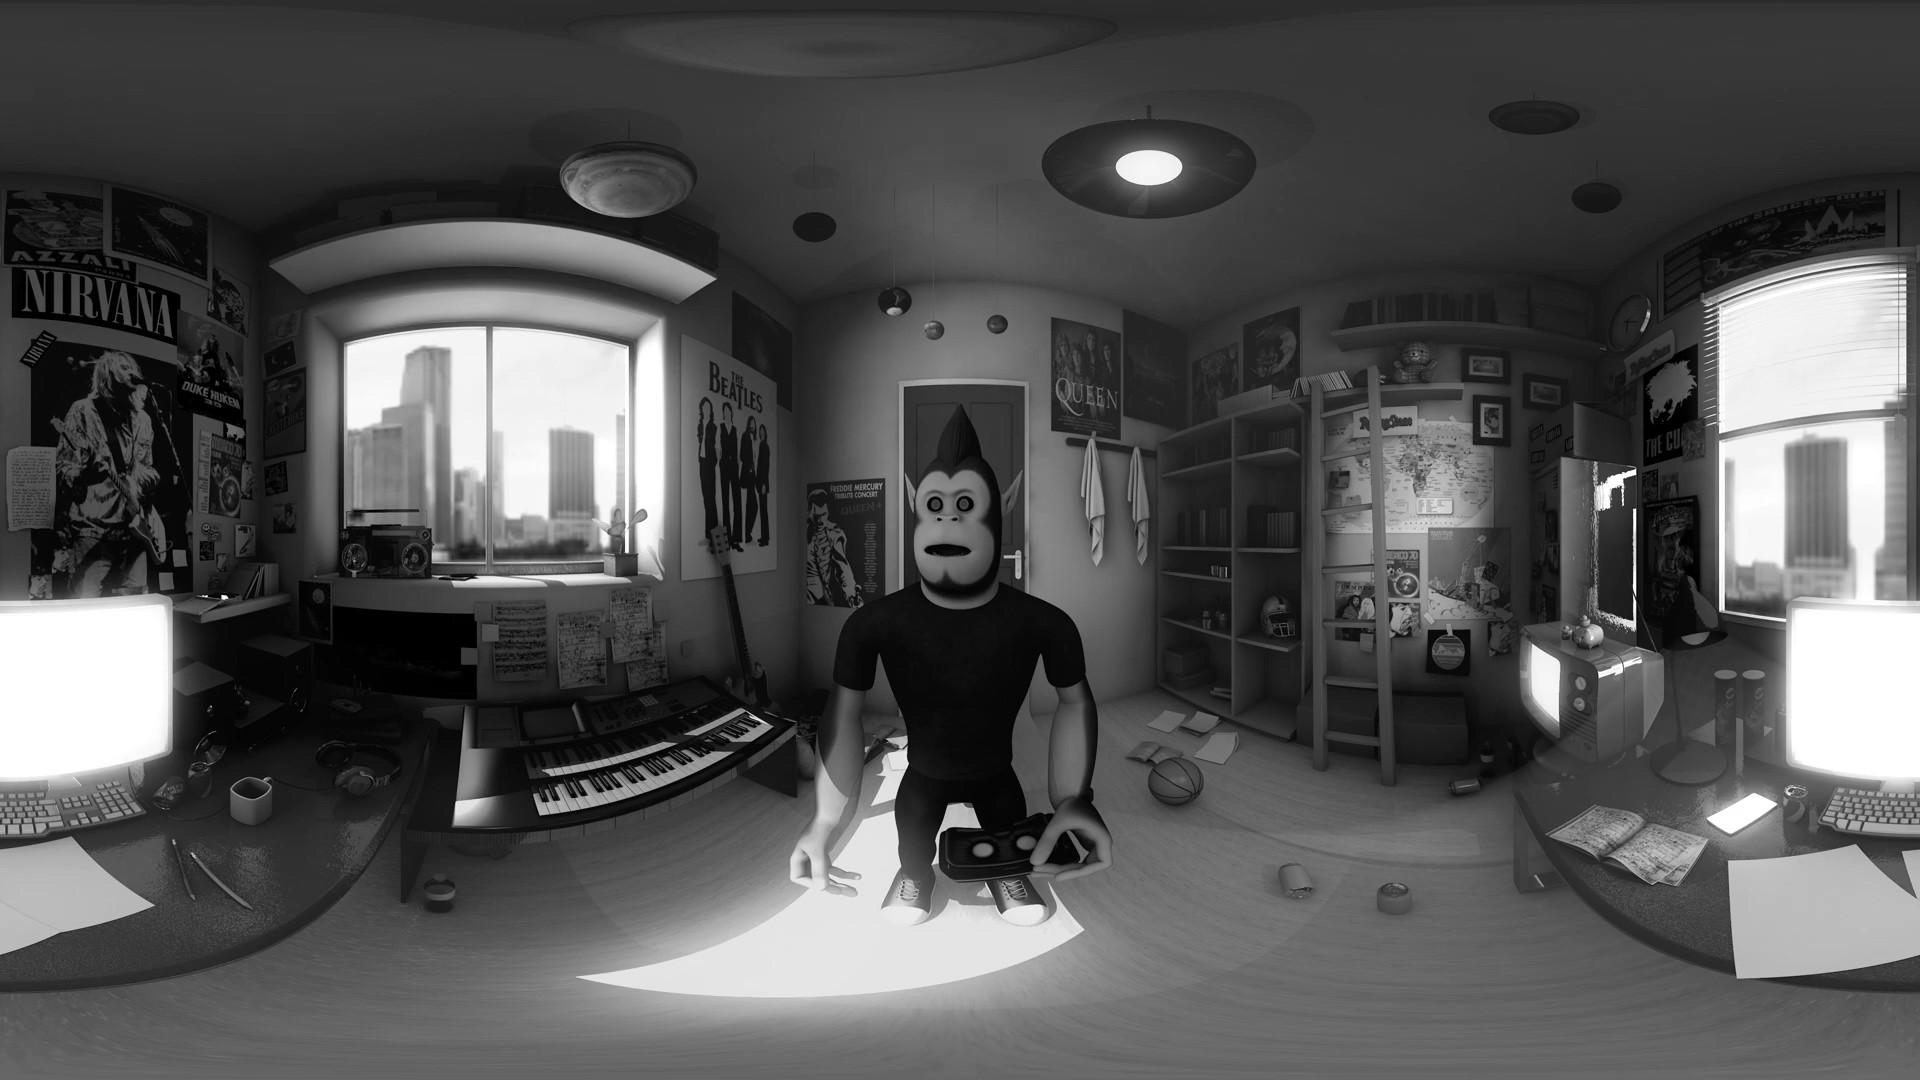 Rocketz_VR - YouTube (1080p).mp4_2020041